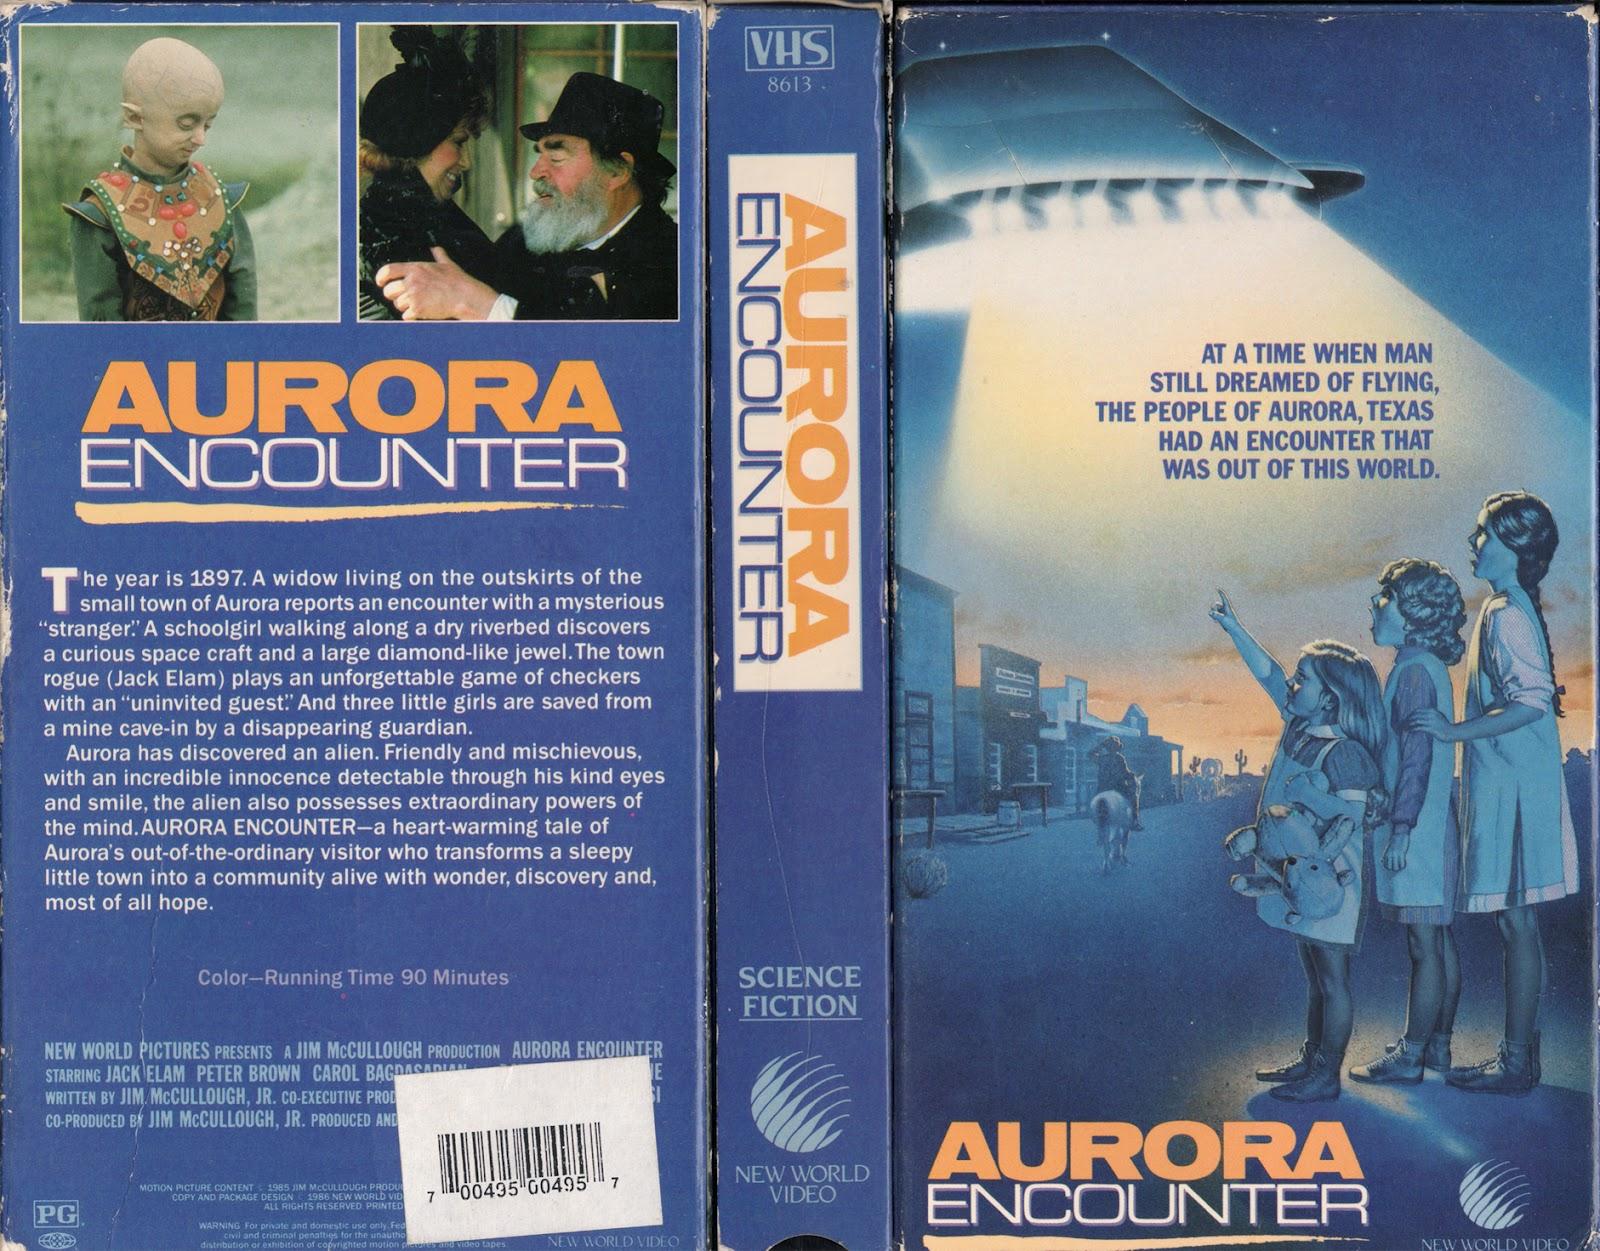 aurora encounter